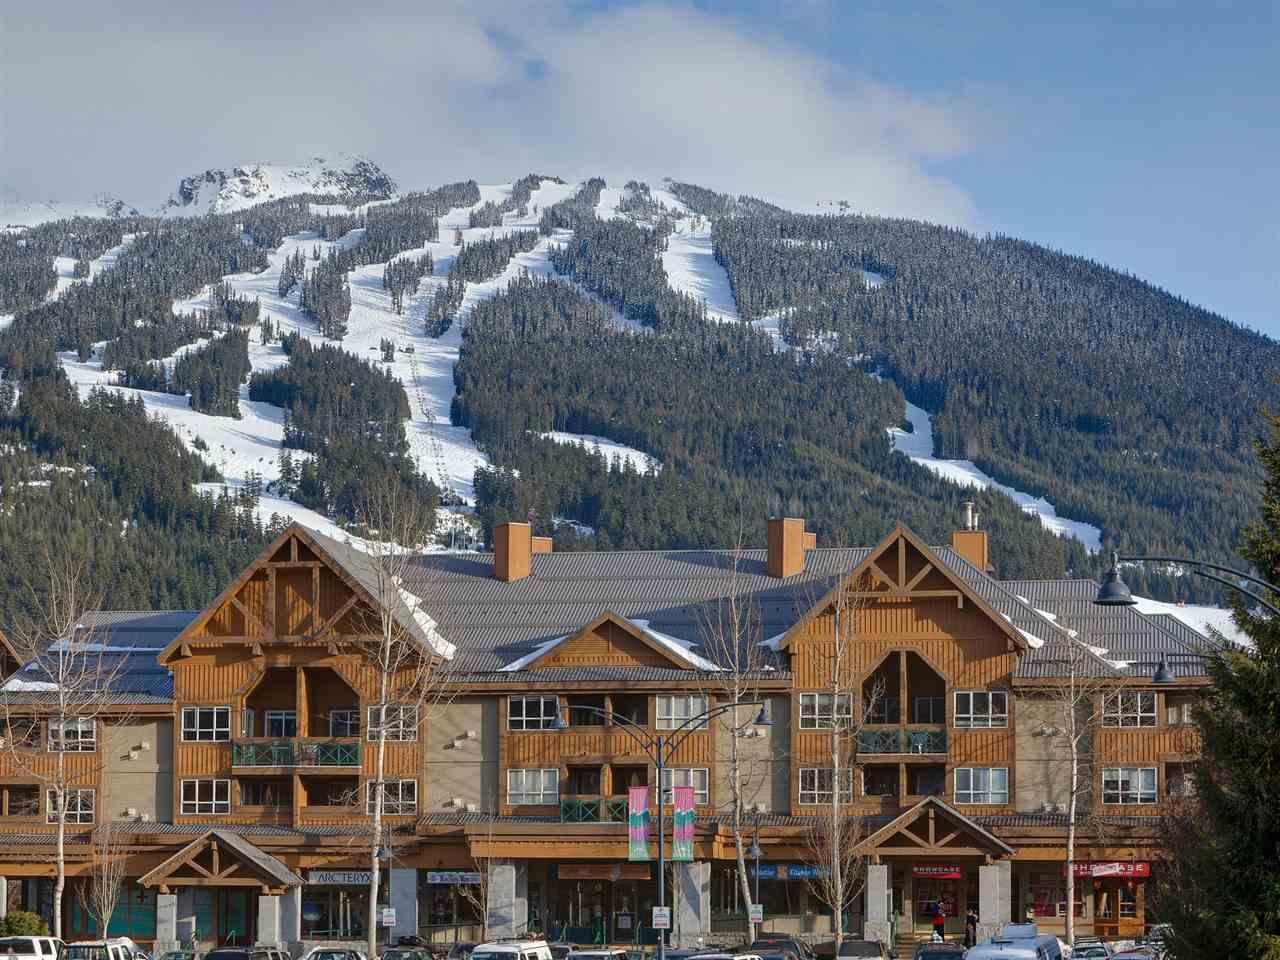 Main Photo: 326 4360 LORIMER ROAD in Whistler: Whistler Village Condo for sale : MLS®# R2127379